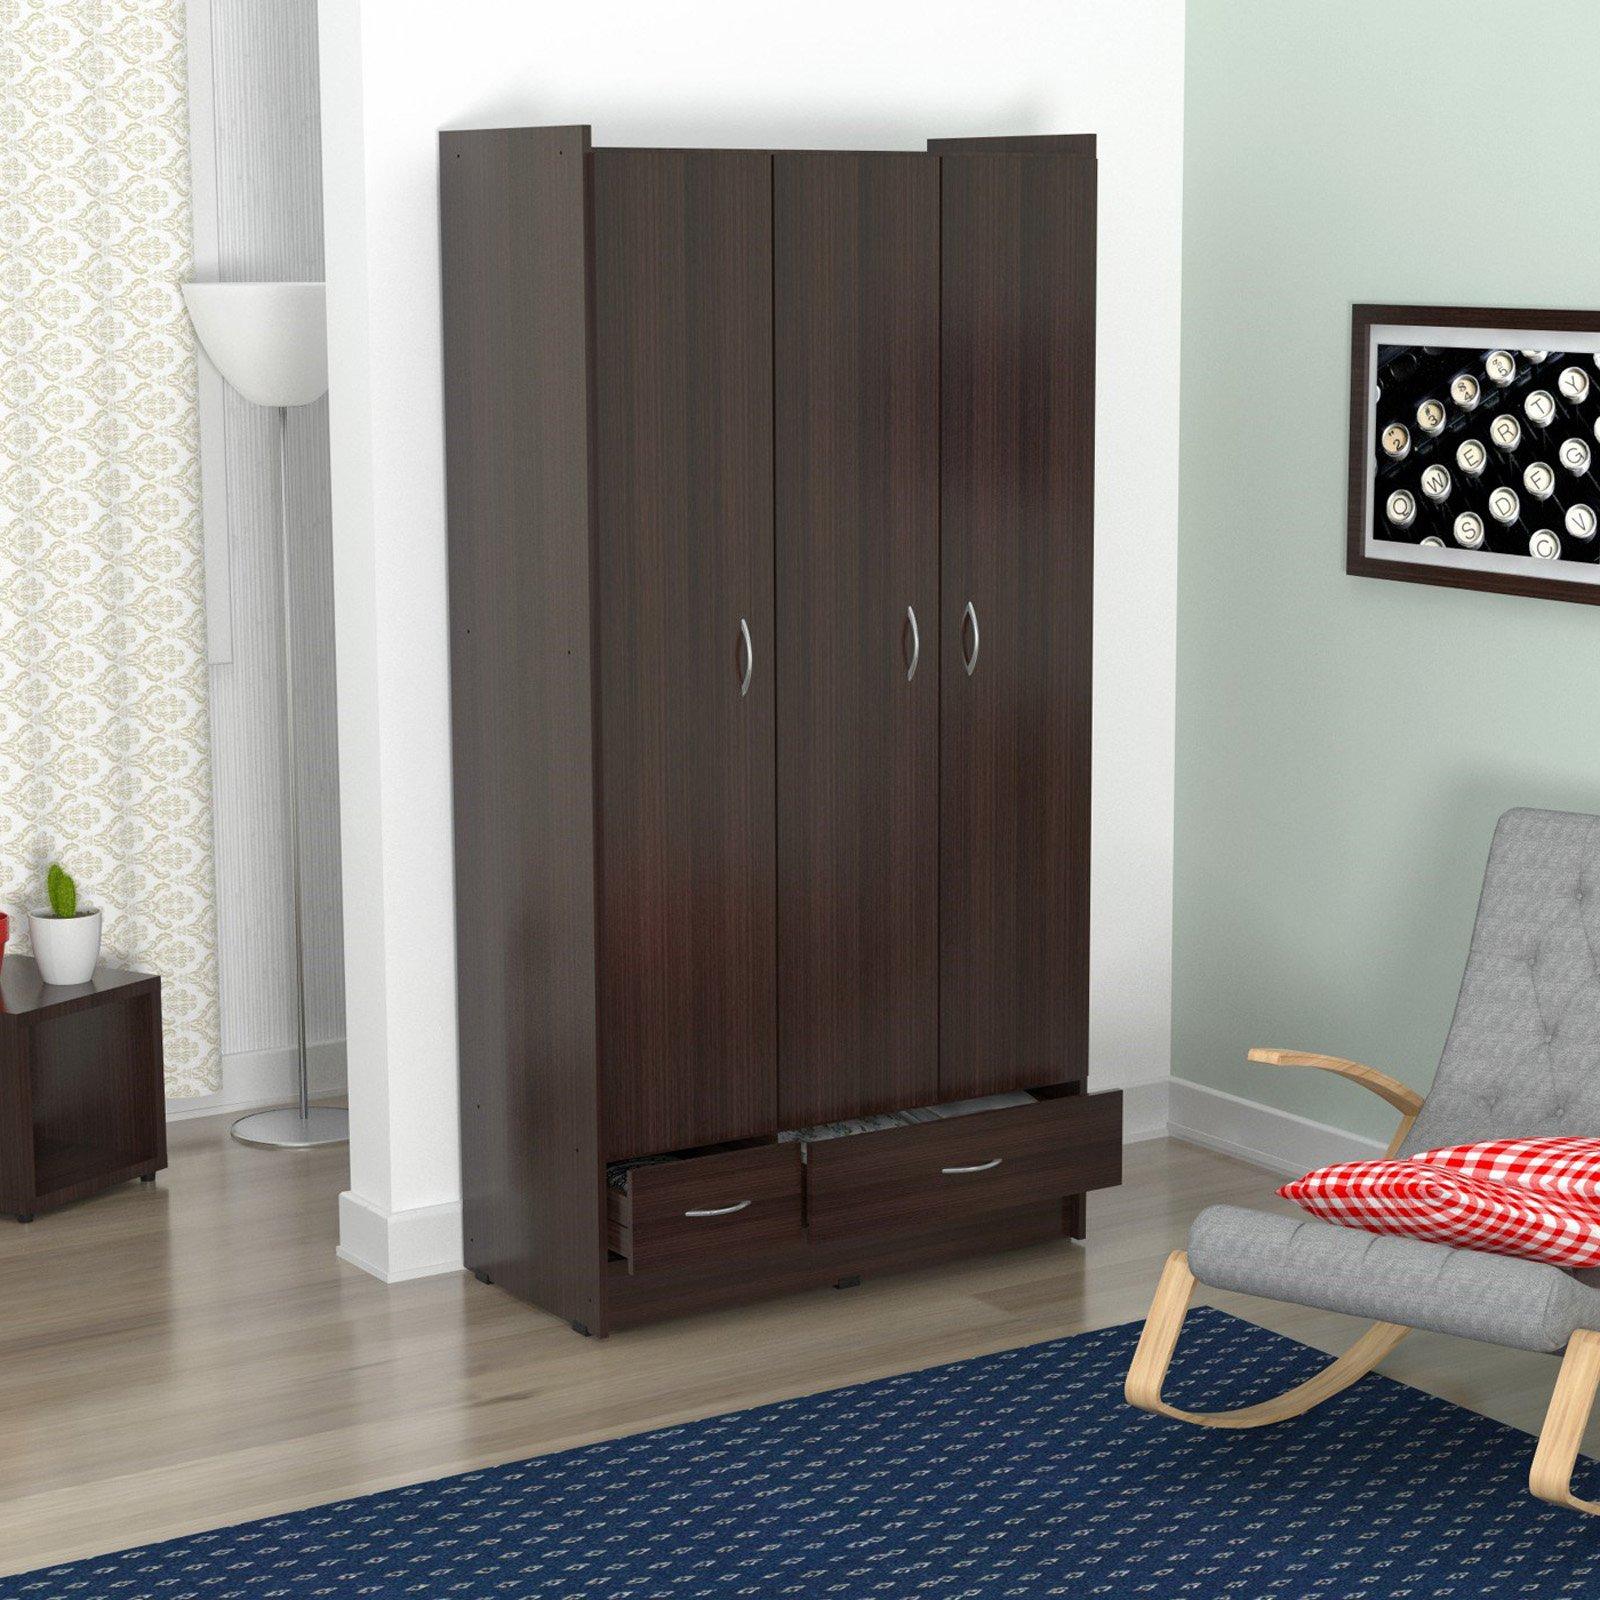 Inval Three Door 2 Drawer Wardrobe/Armoire, Espresso-Wengue Finish